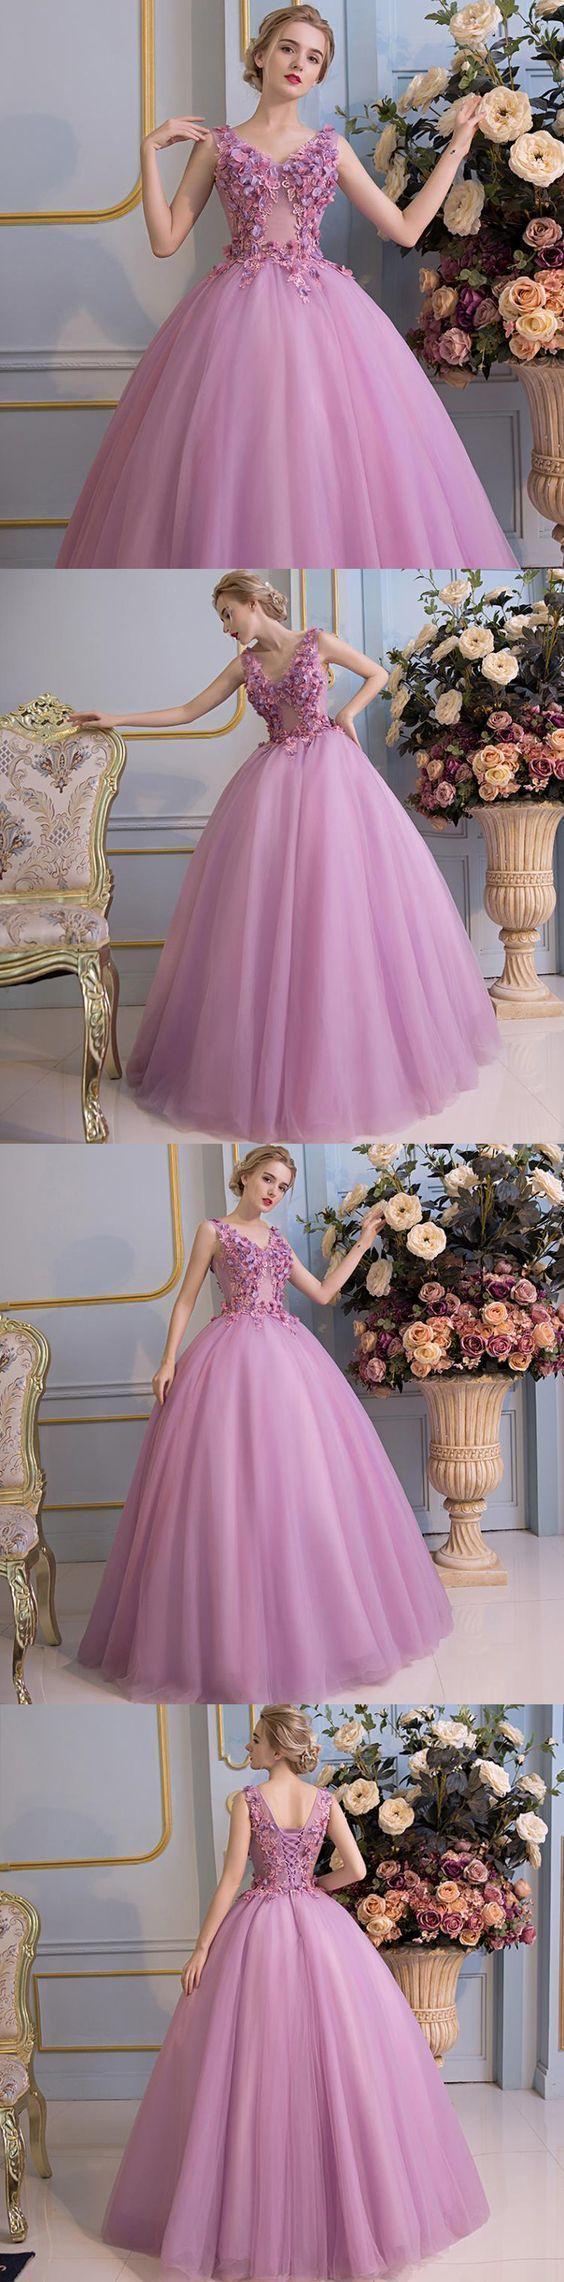 47a454b9e2 Princess Ball Gown Prom Dresses Black